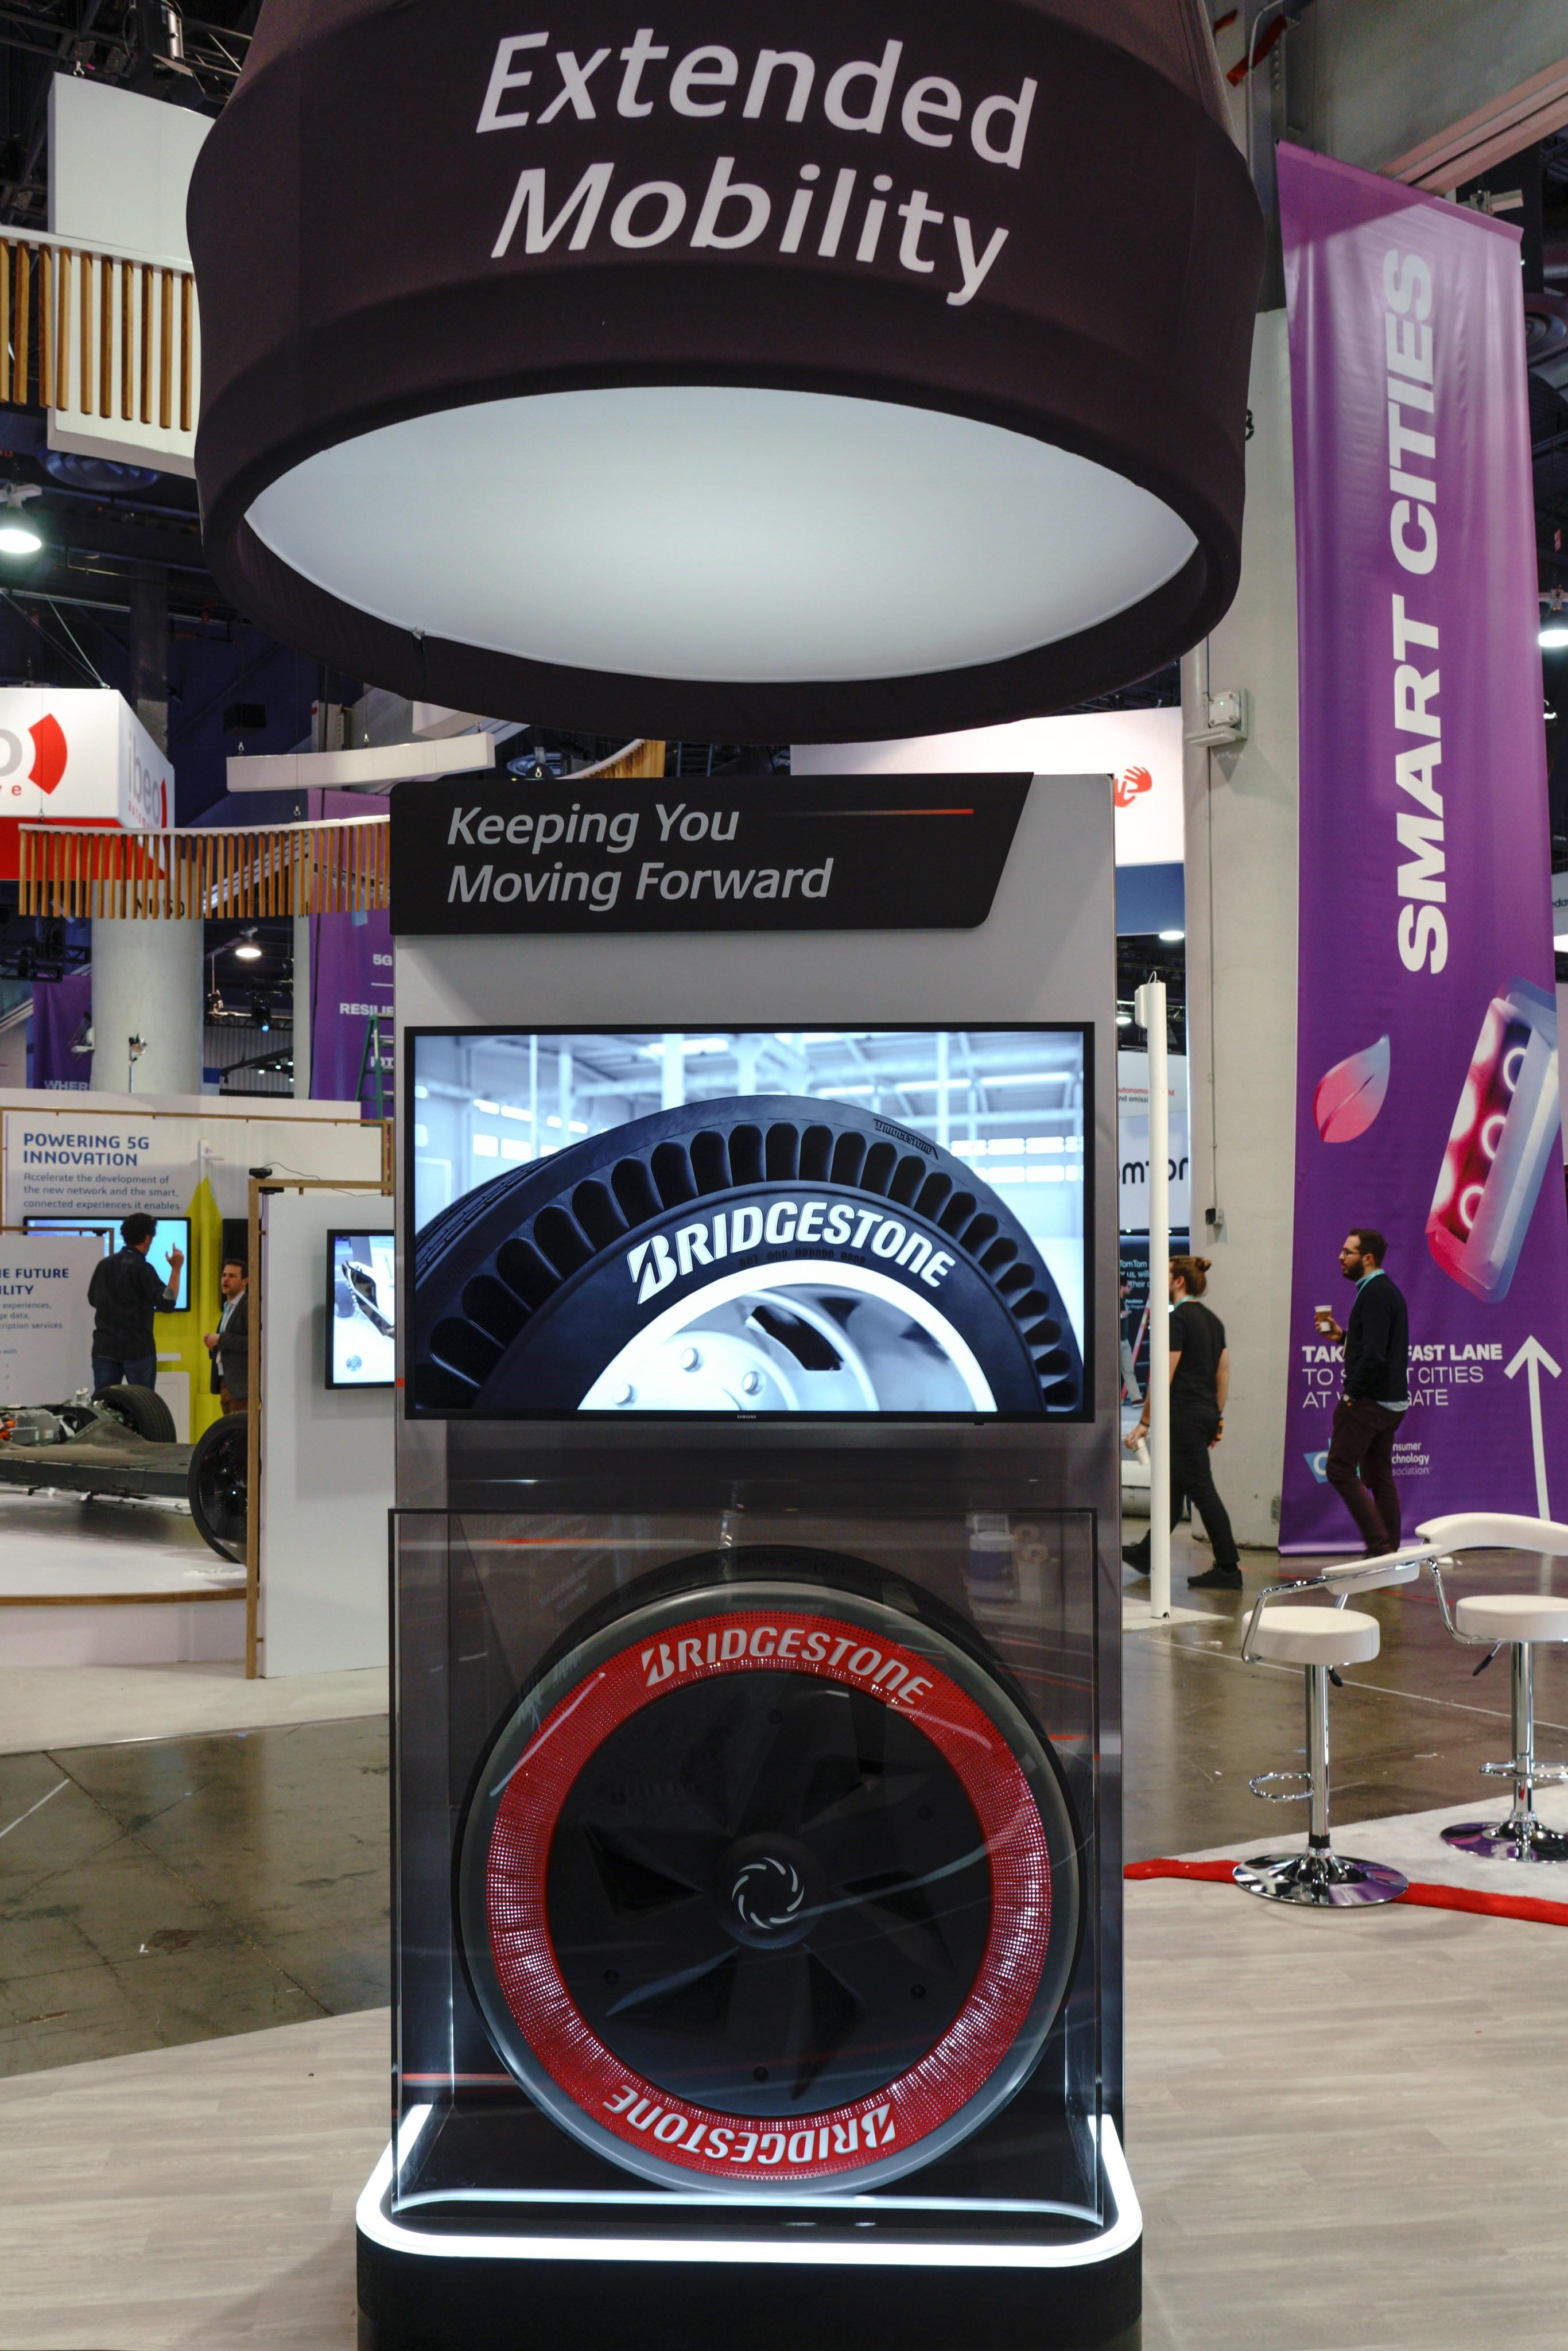 MTD Exclusive: An Up-Close Look at Bridgestone's